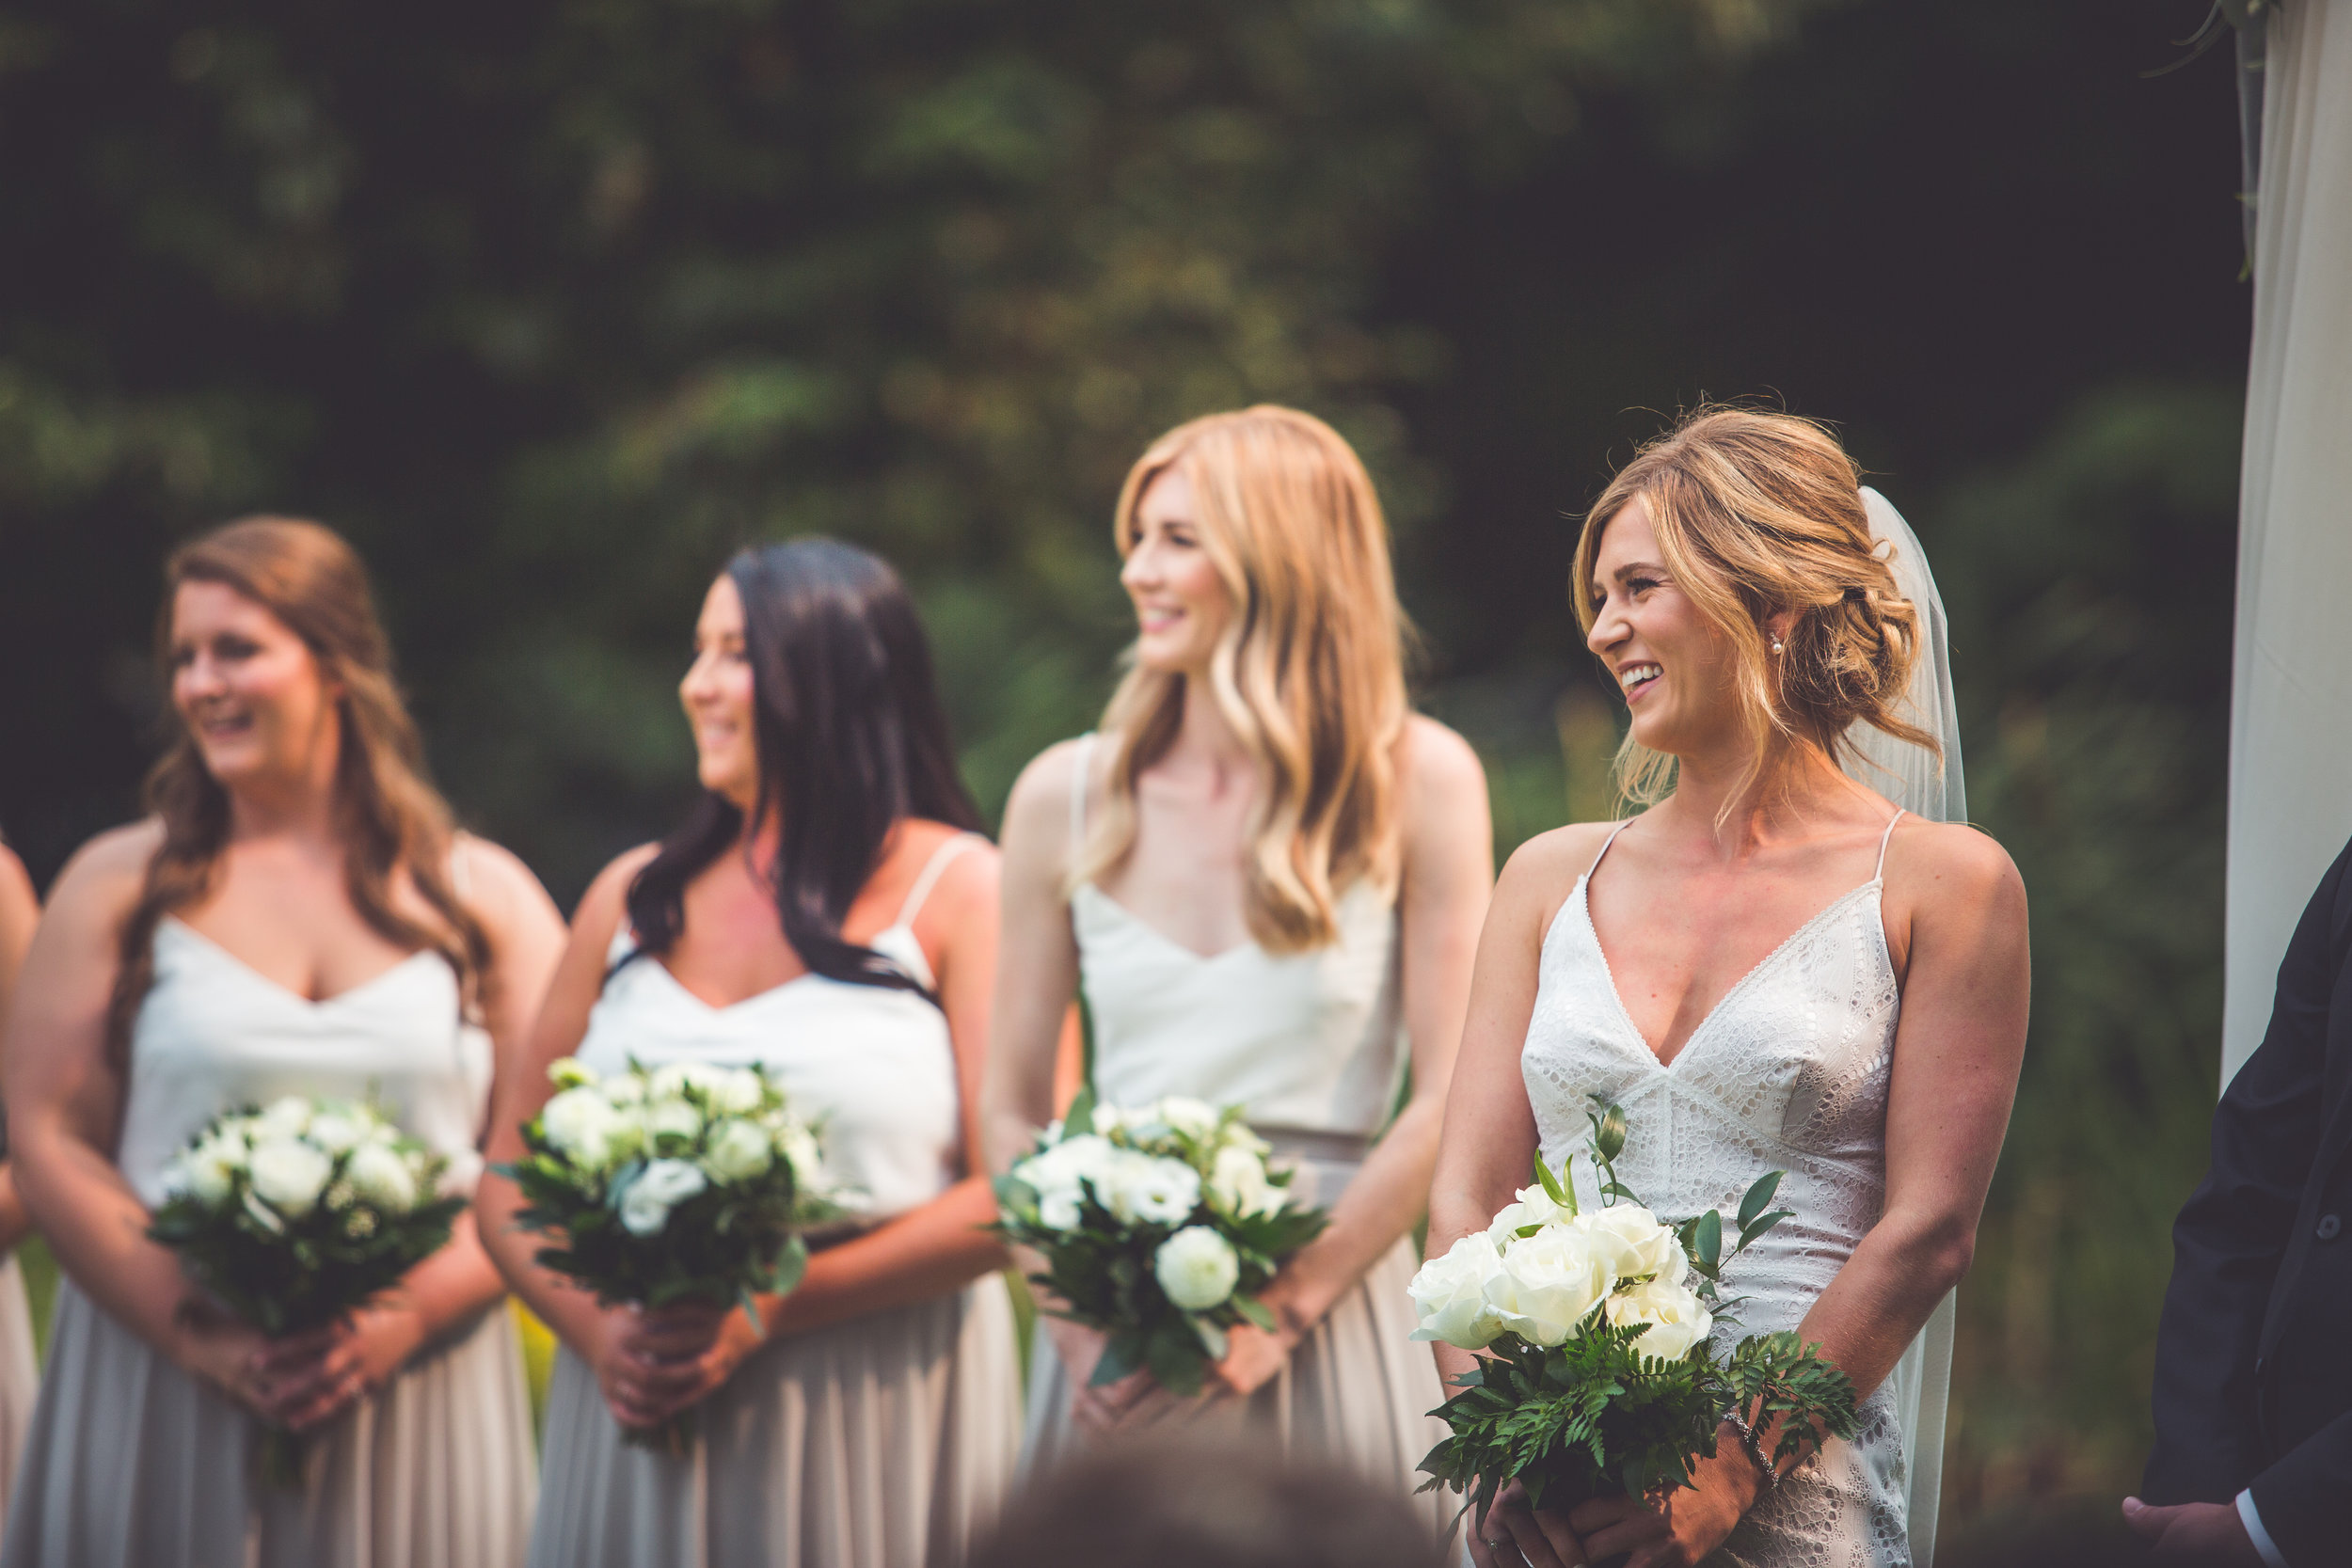 Vancouver Island bride smiles during wedding ceremony